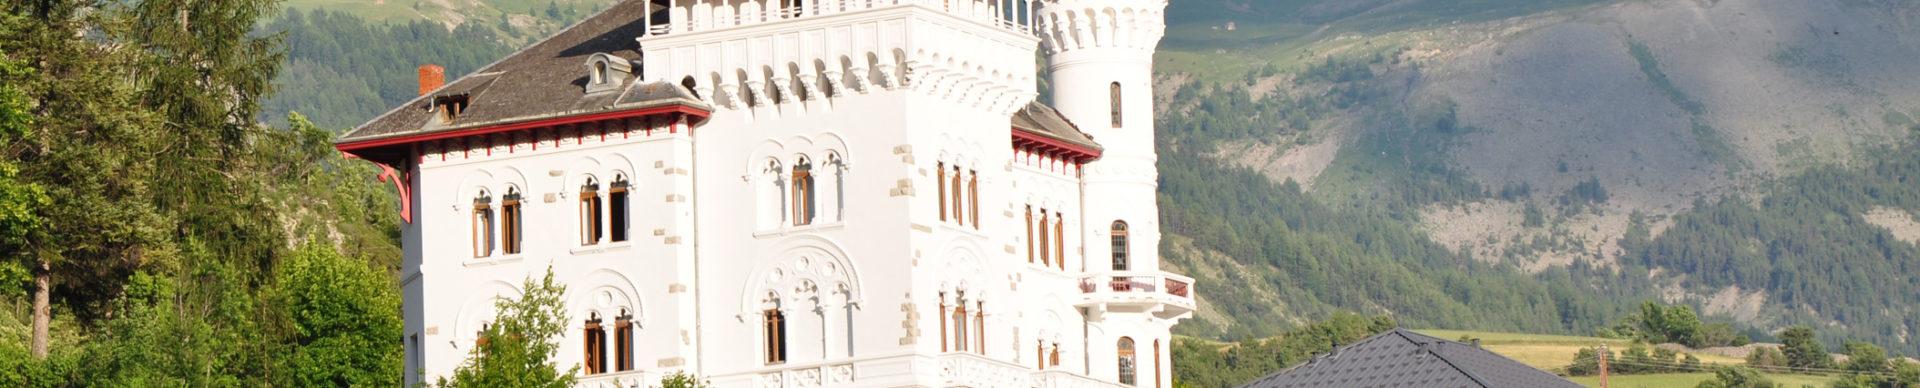 residenze di turismo chateau des Magnans Jausiers